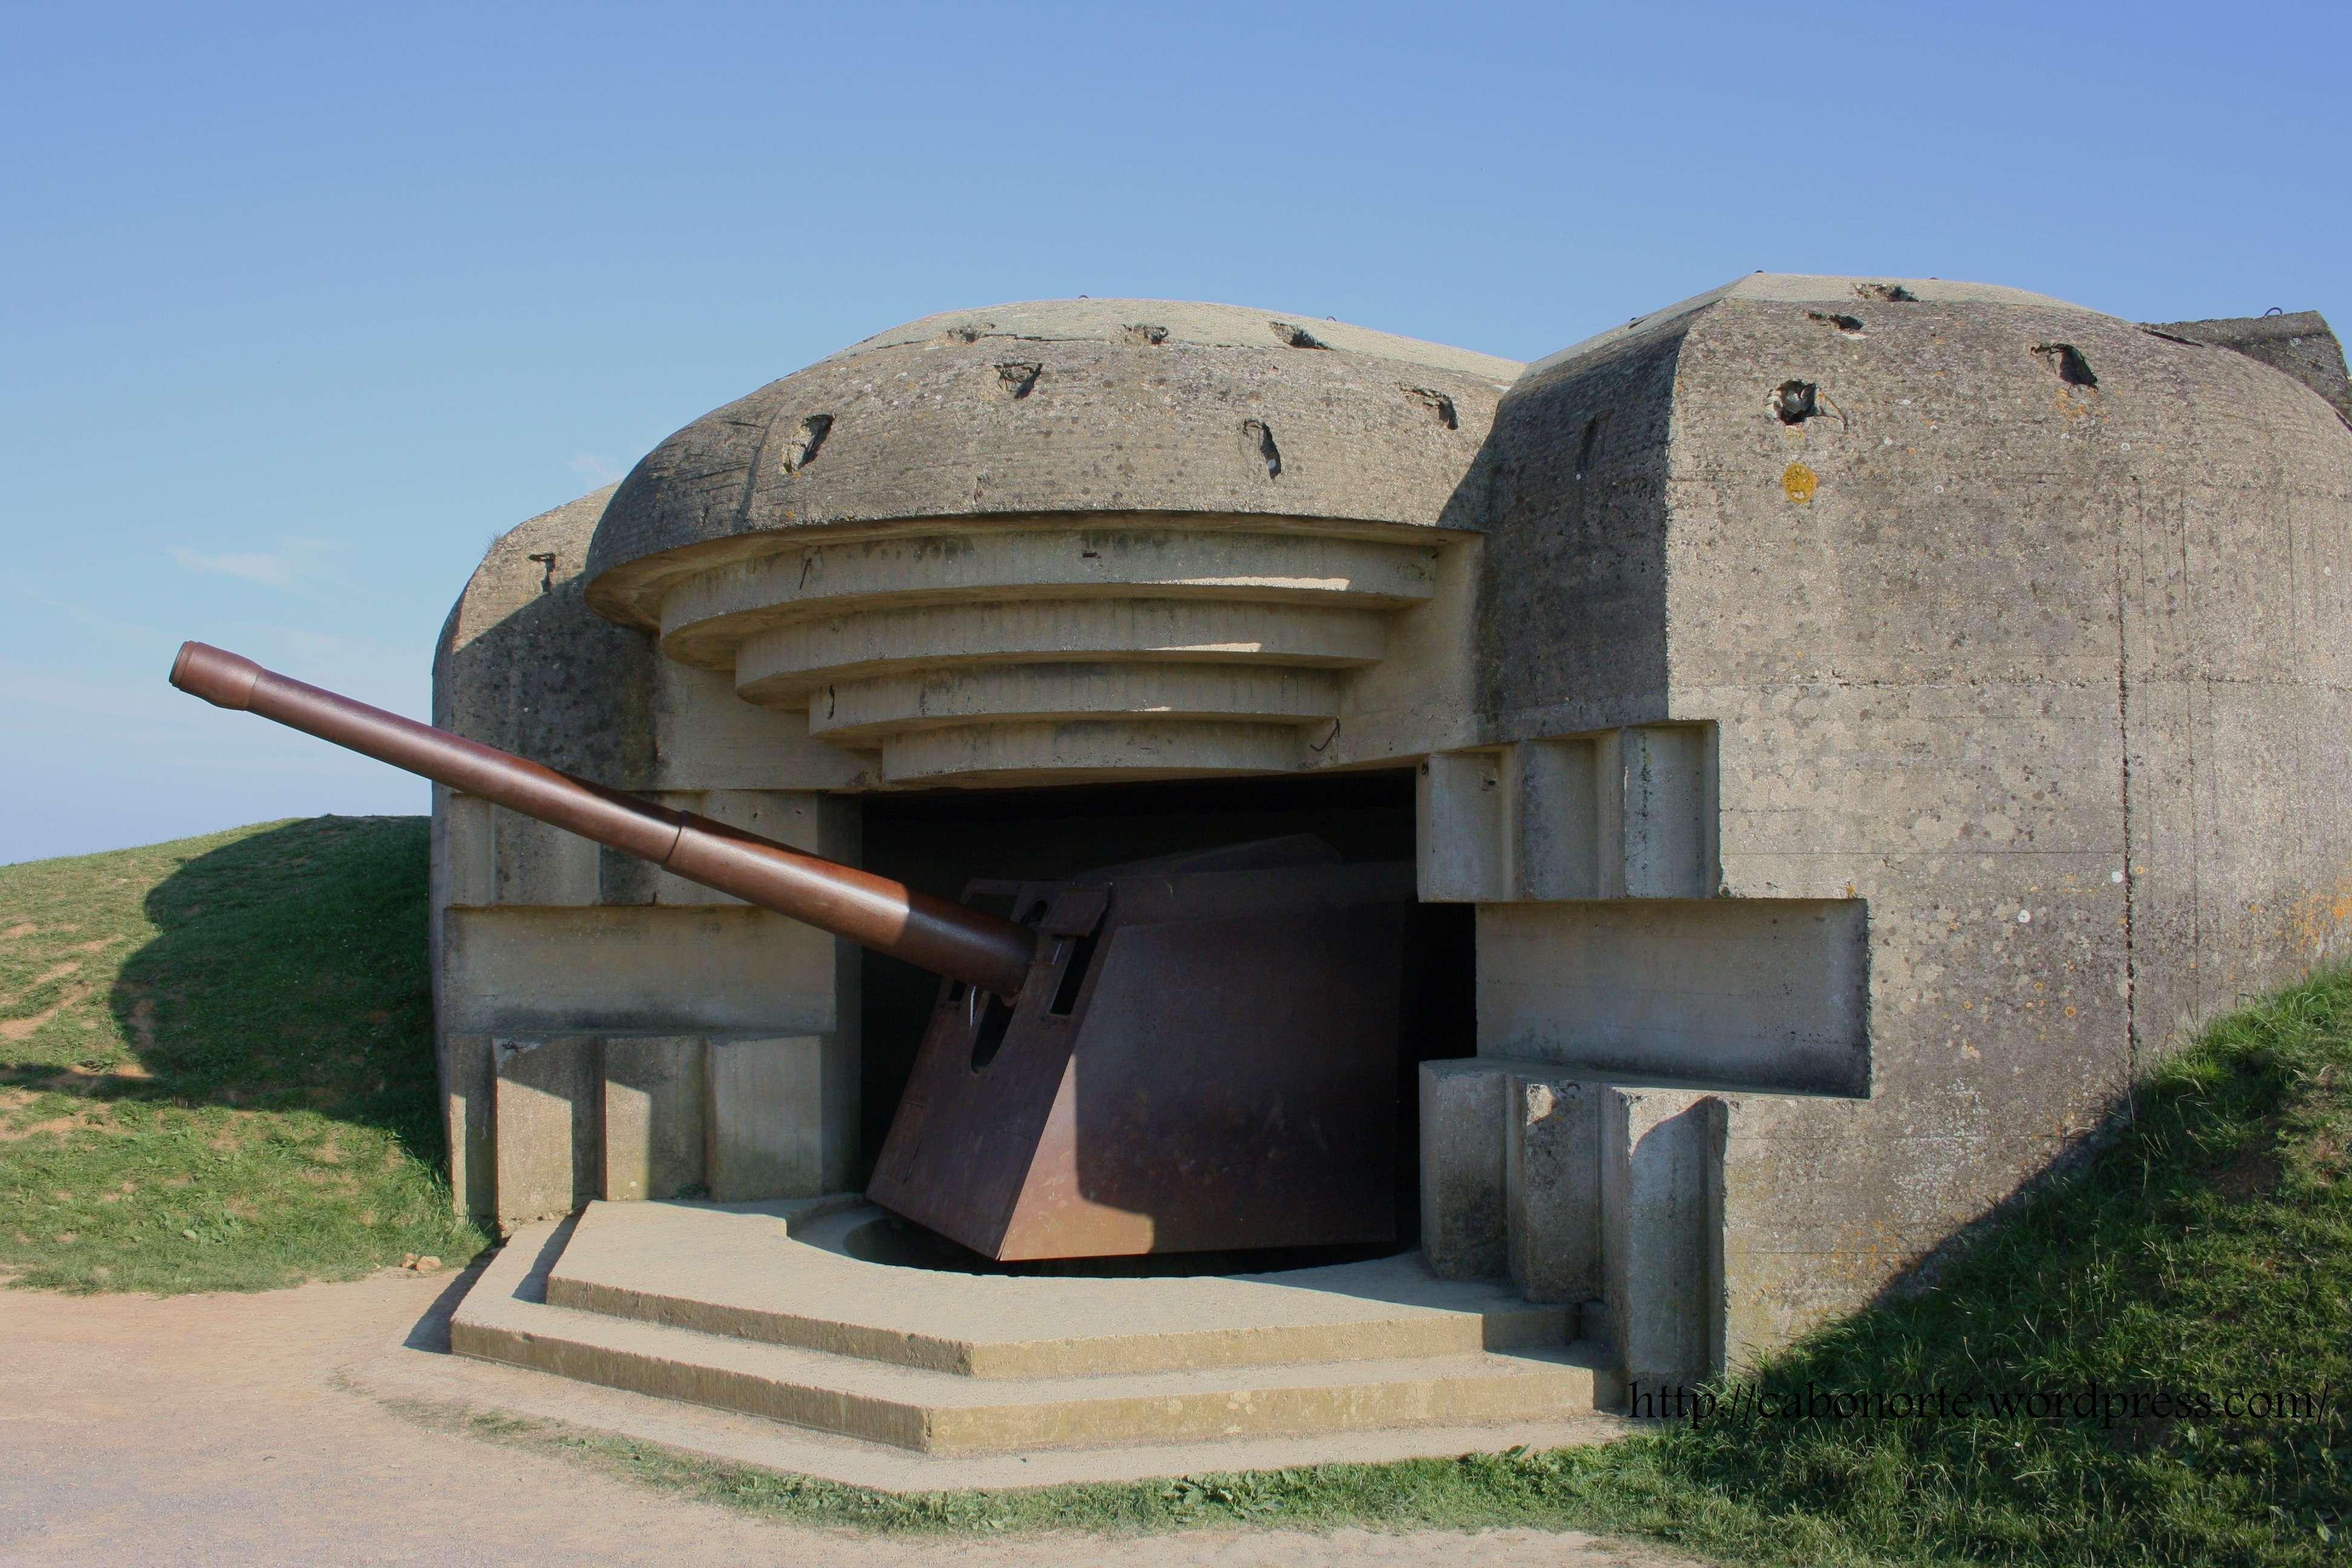 Batería de cañóns en Longues-sur-mer, Normandía